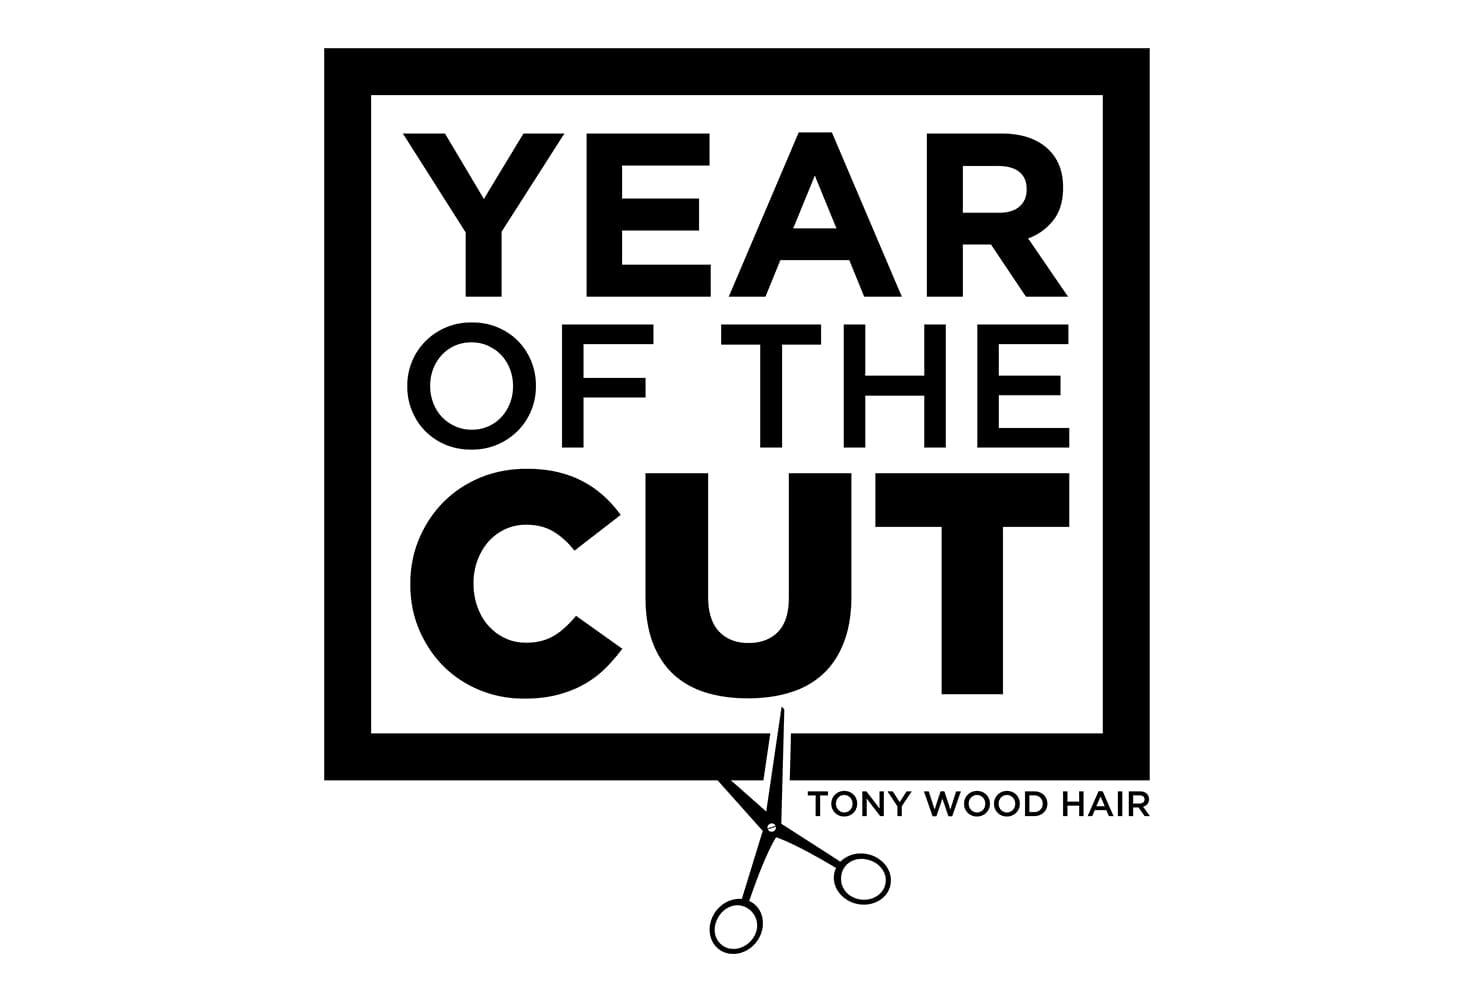 Year of the Cut.jpg